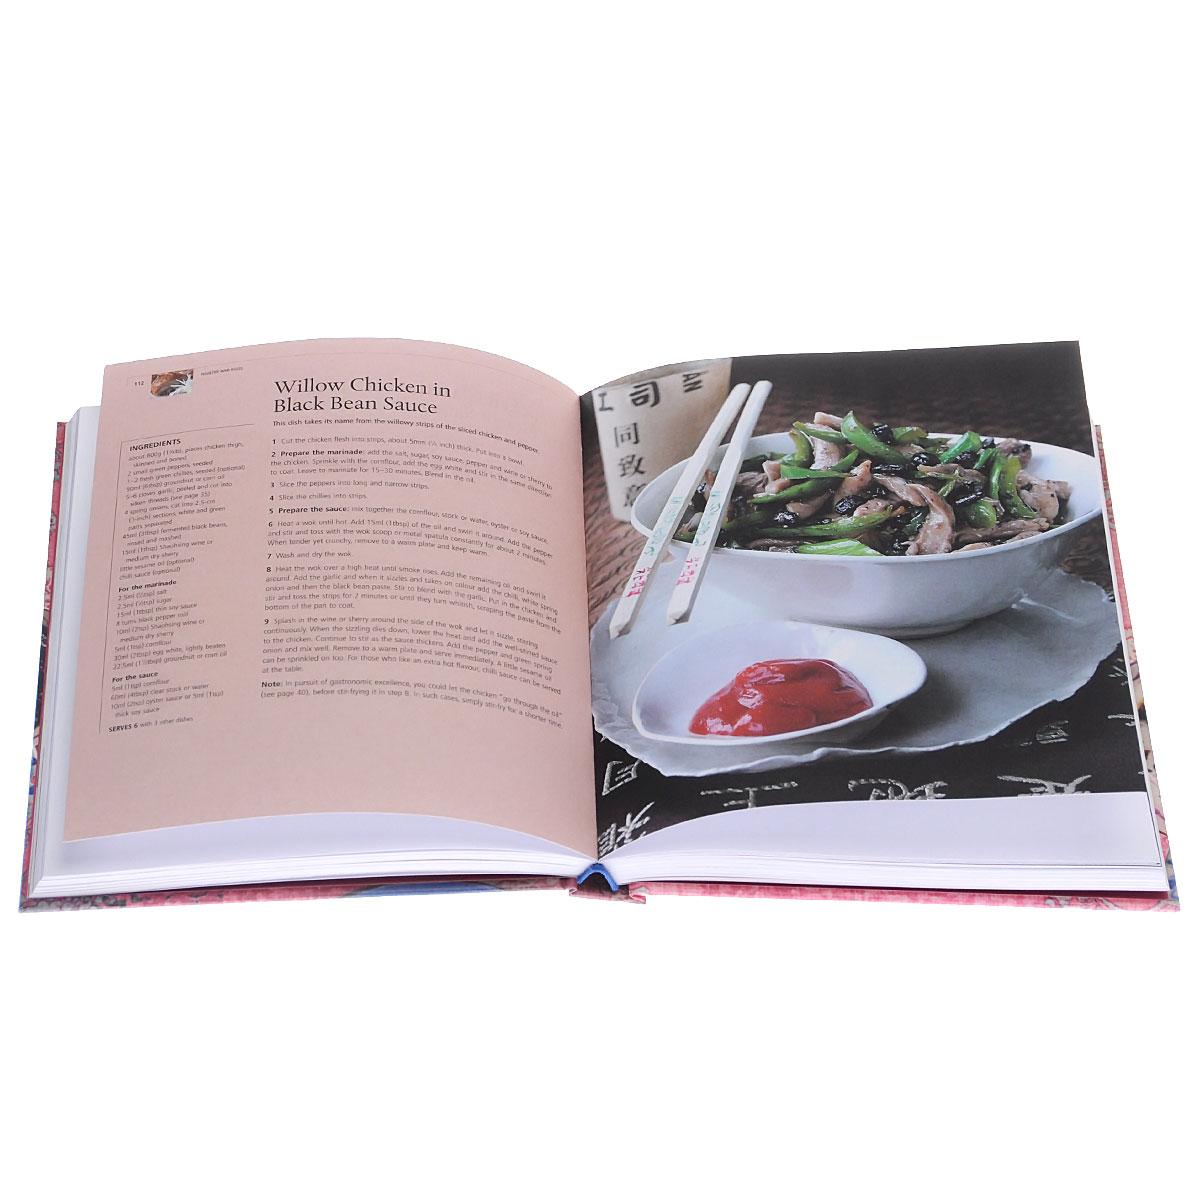 Yan Kit's Classic Chinese Cookbook